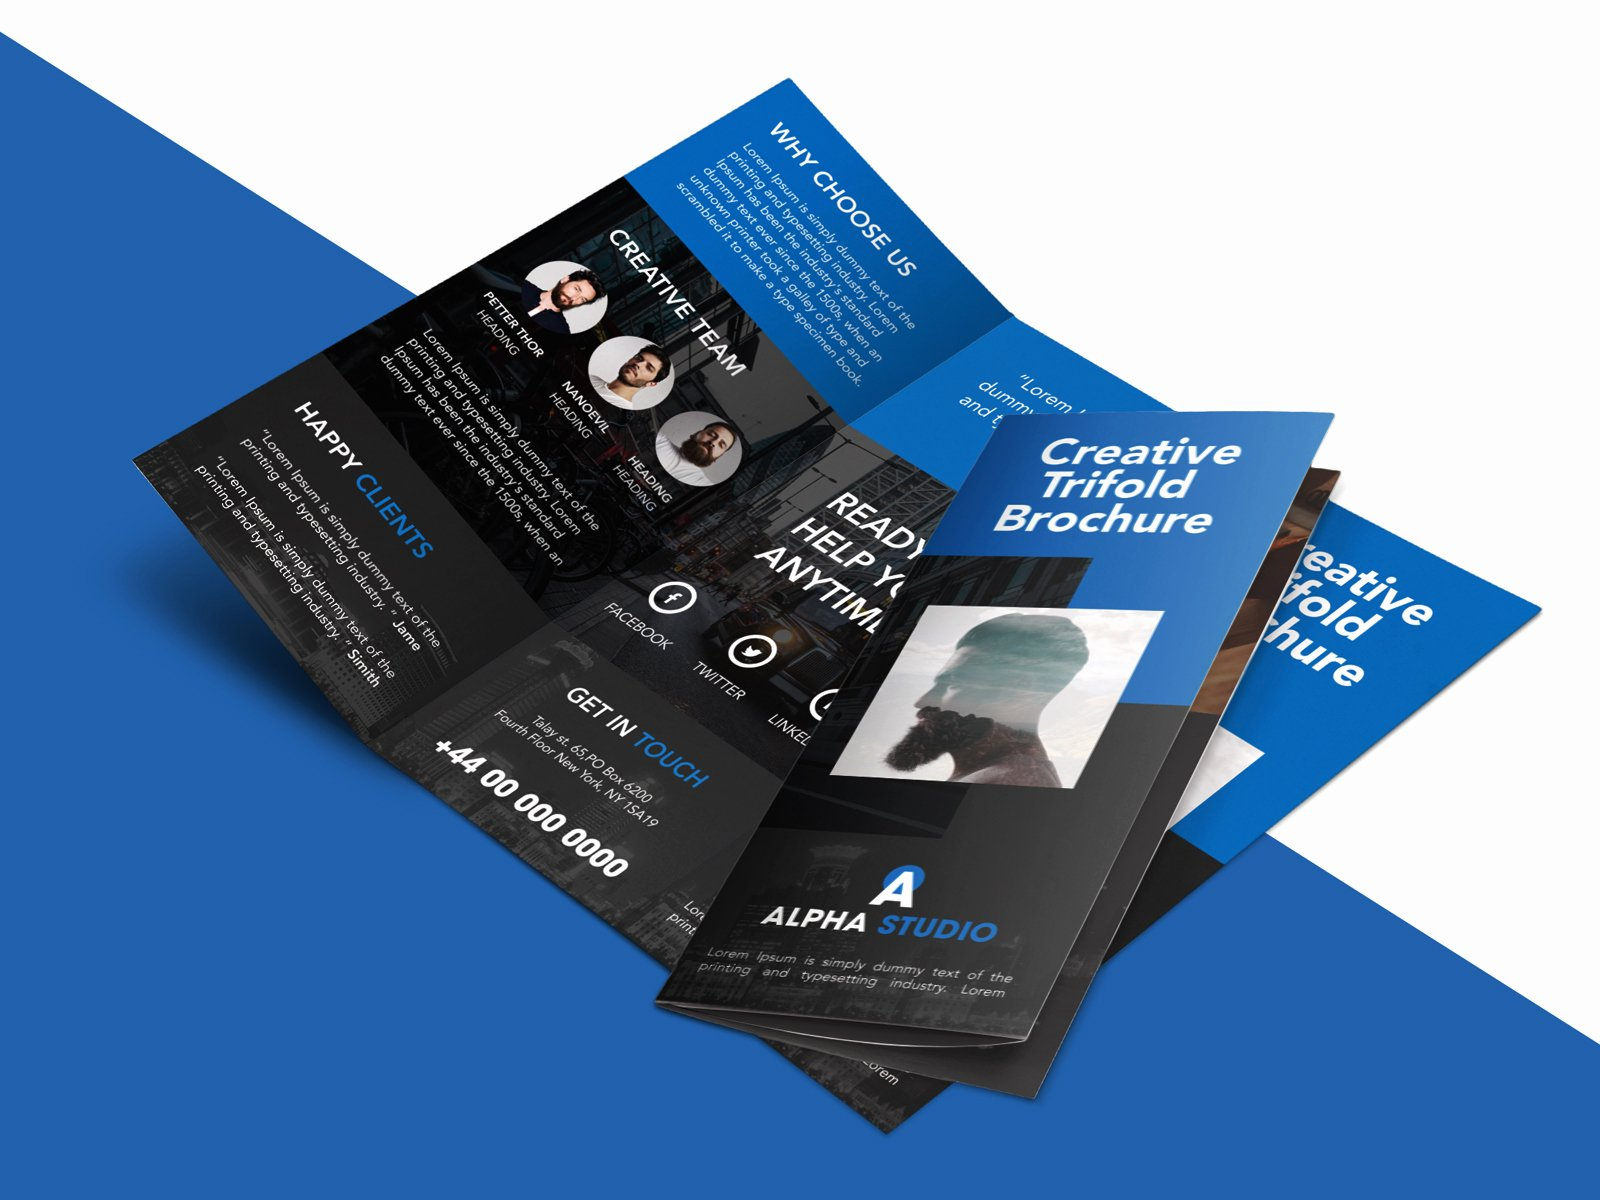 Trifold Brochure Template Photoshop Elegant Creative Agency Trifold Brochure Free Psd Template